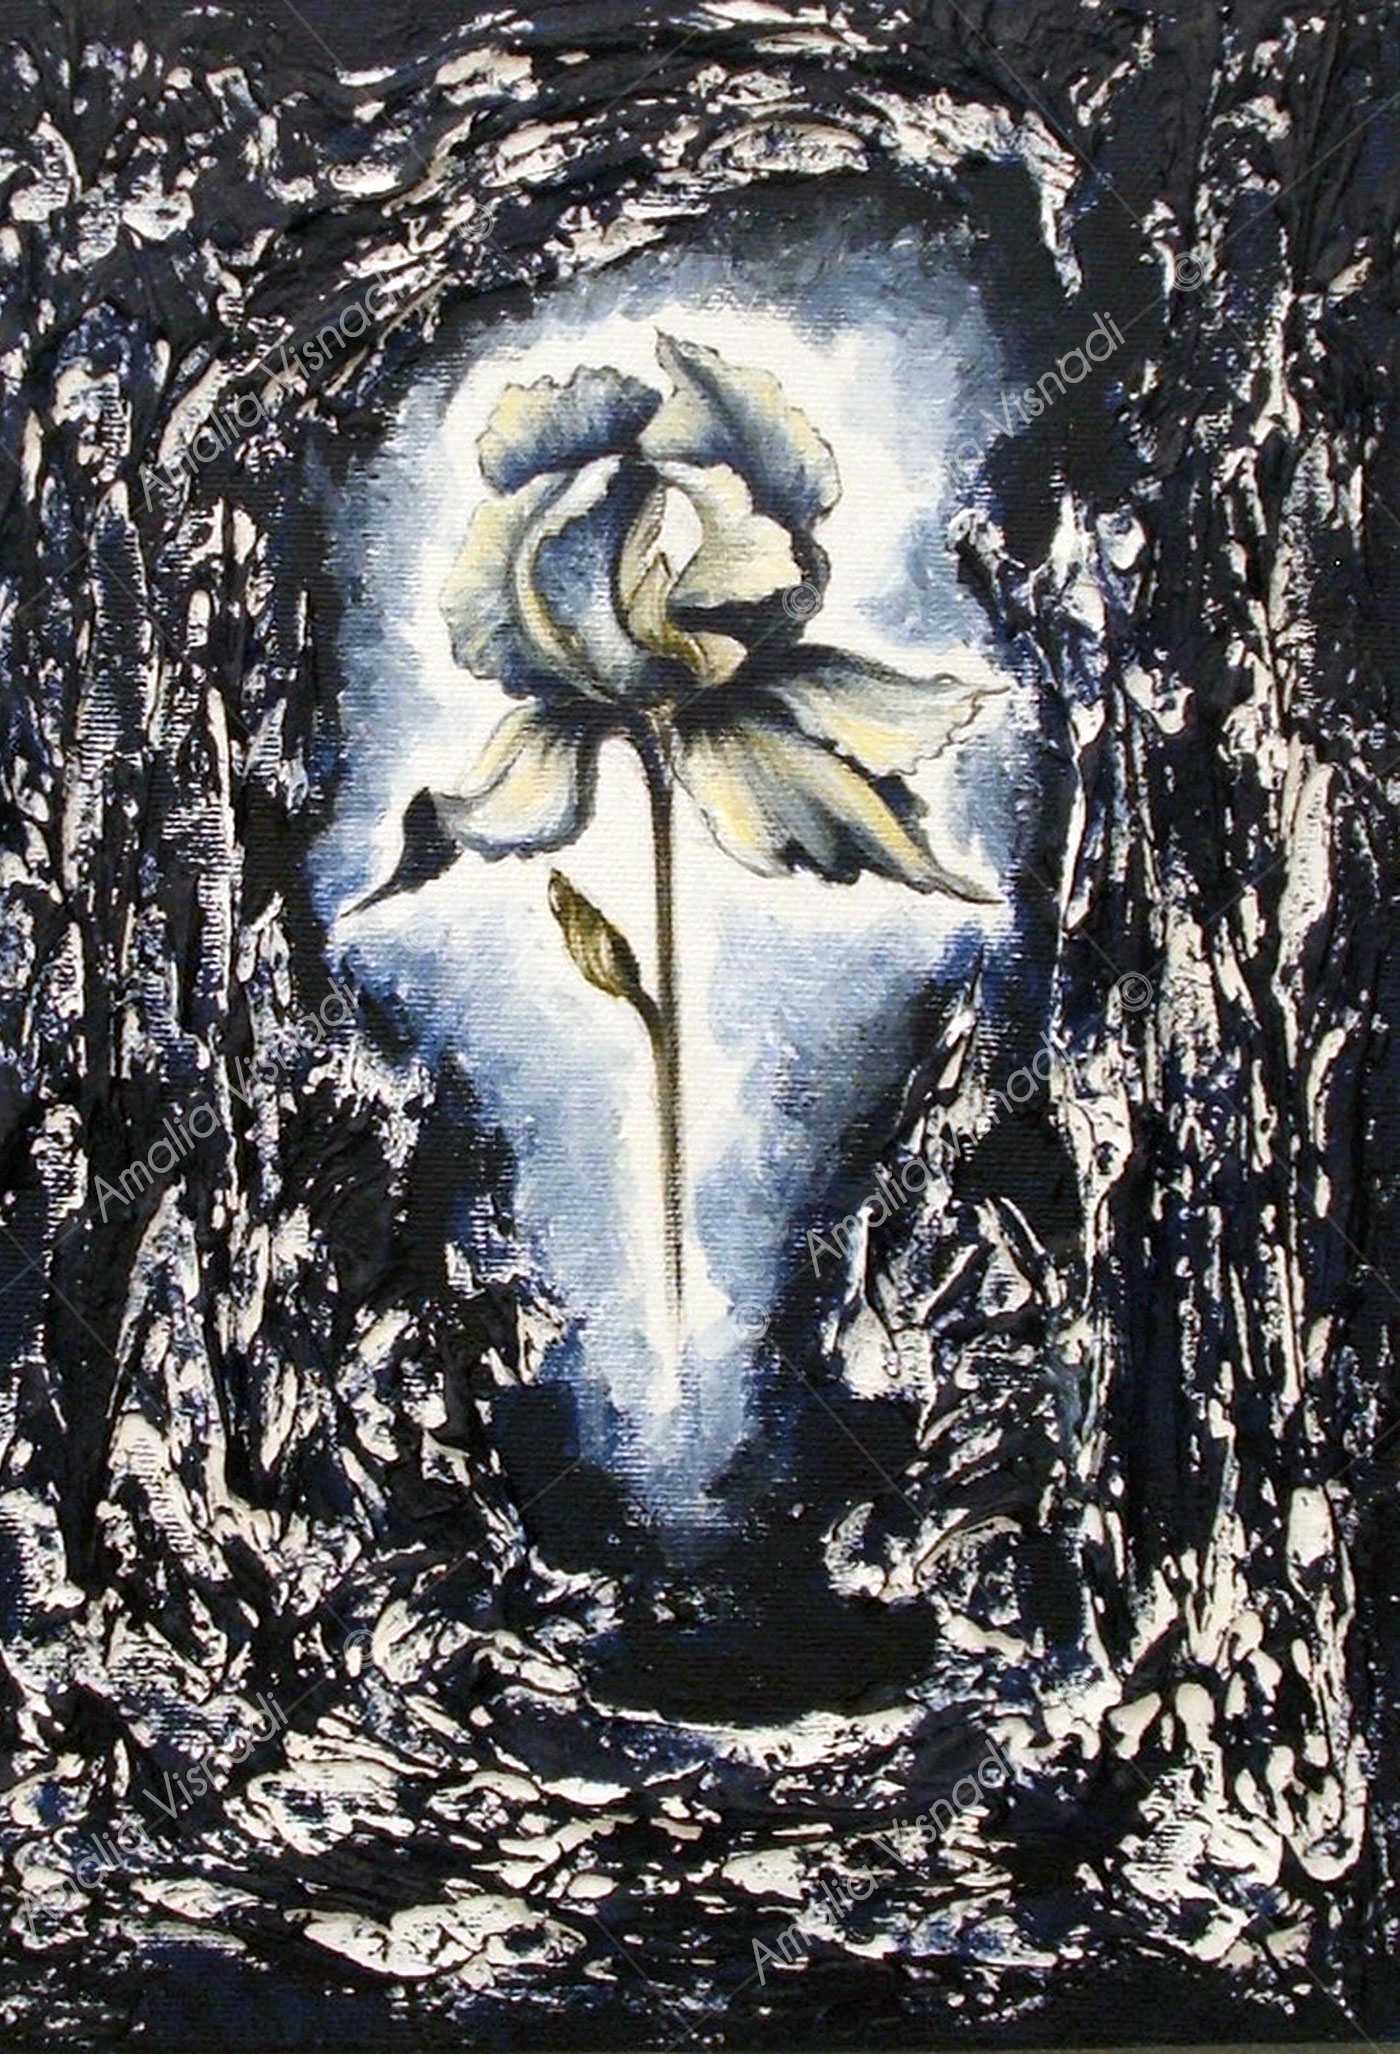 Iris_Acrilico e olio su tela 24 x30